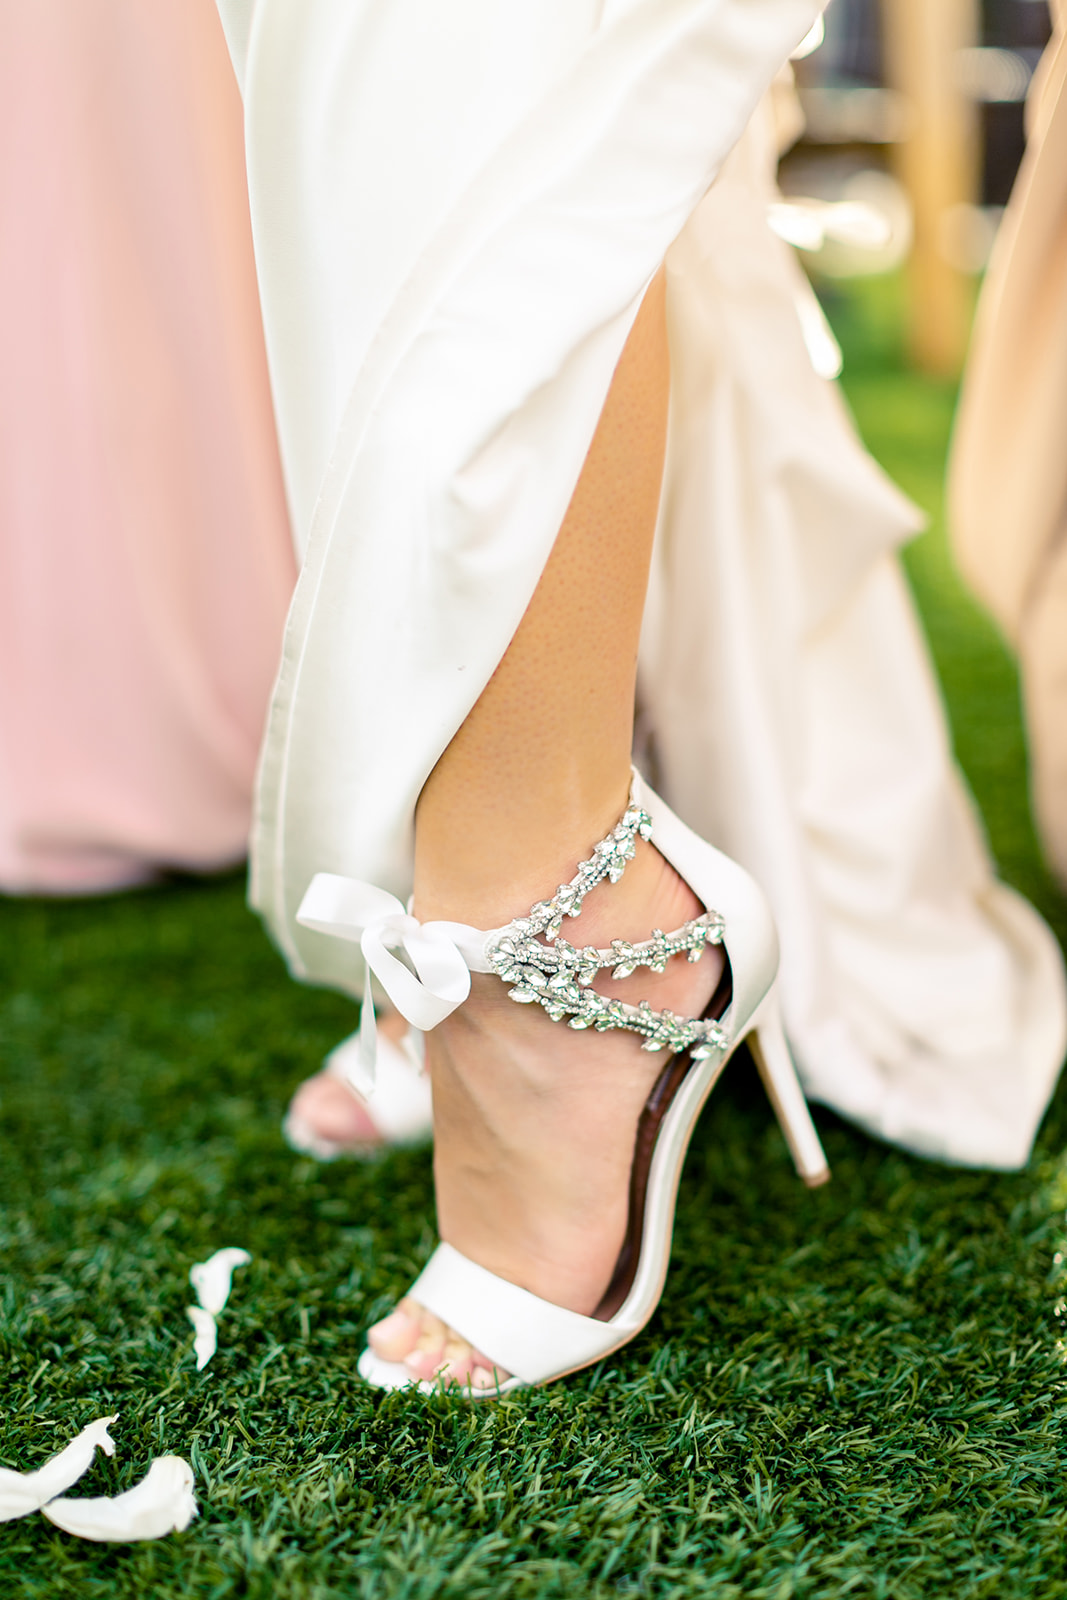 Ben & Emma's Wedding - Natalie Schutt Photography - Details-44.jpg